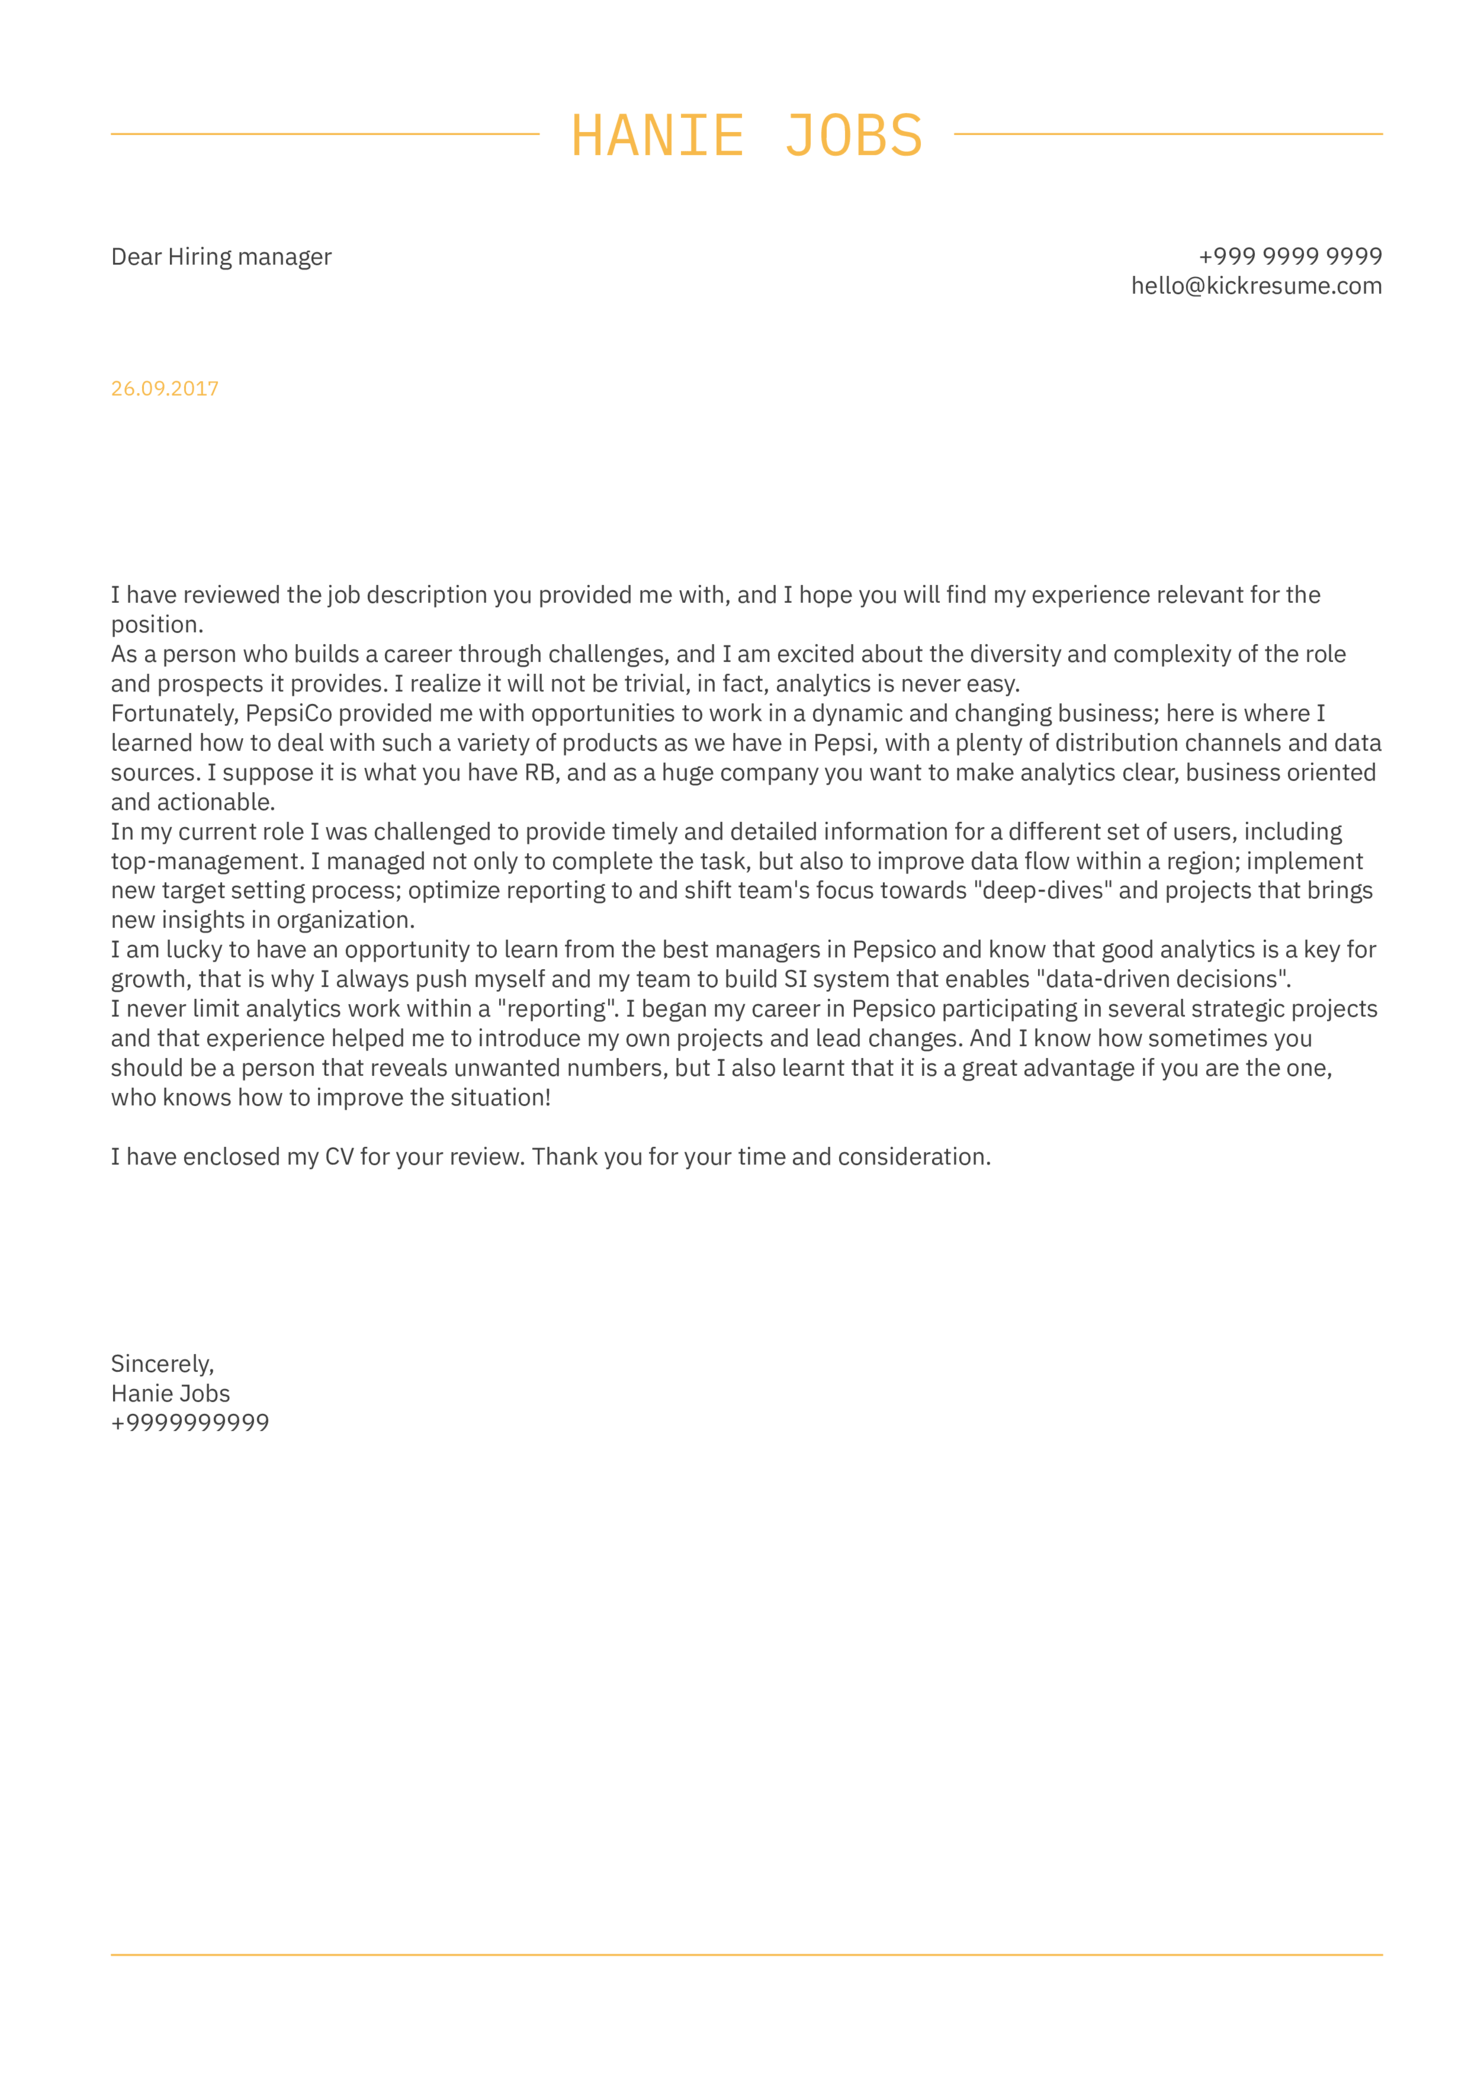 PepsiCo Sales Intelligence Manager Cover Letter Sample